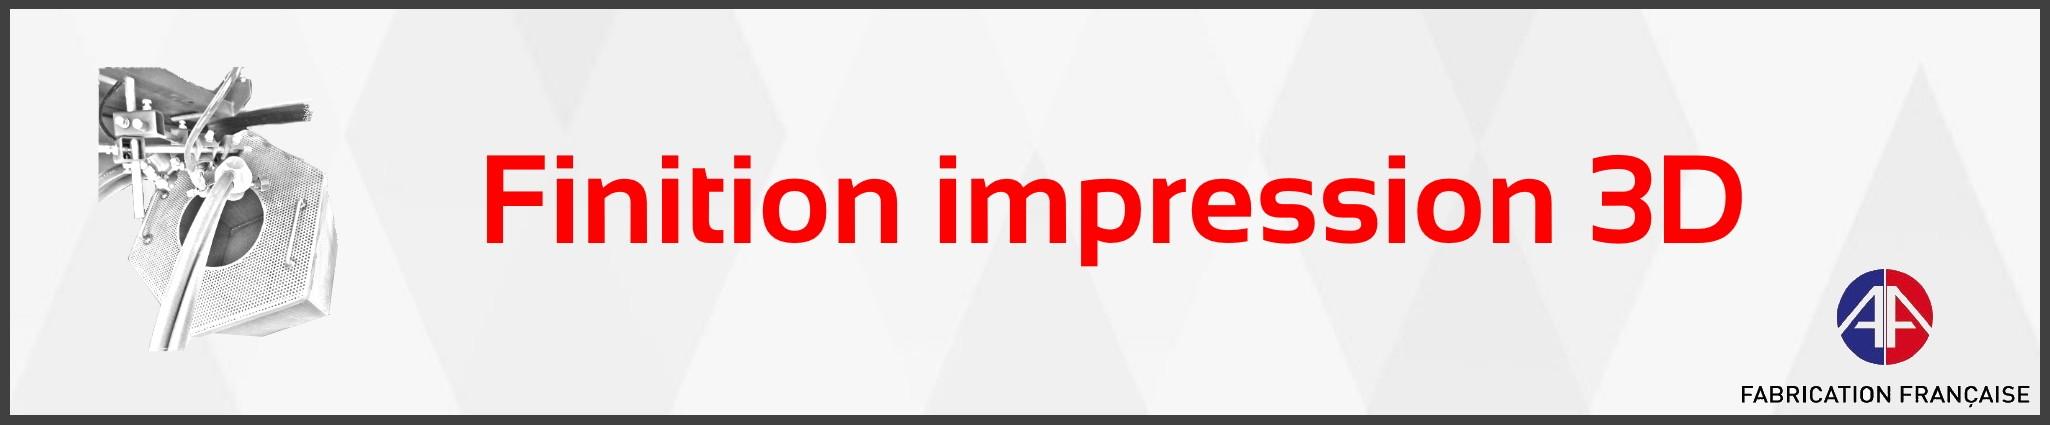 Finition impression 3D